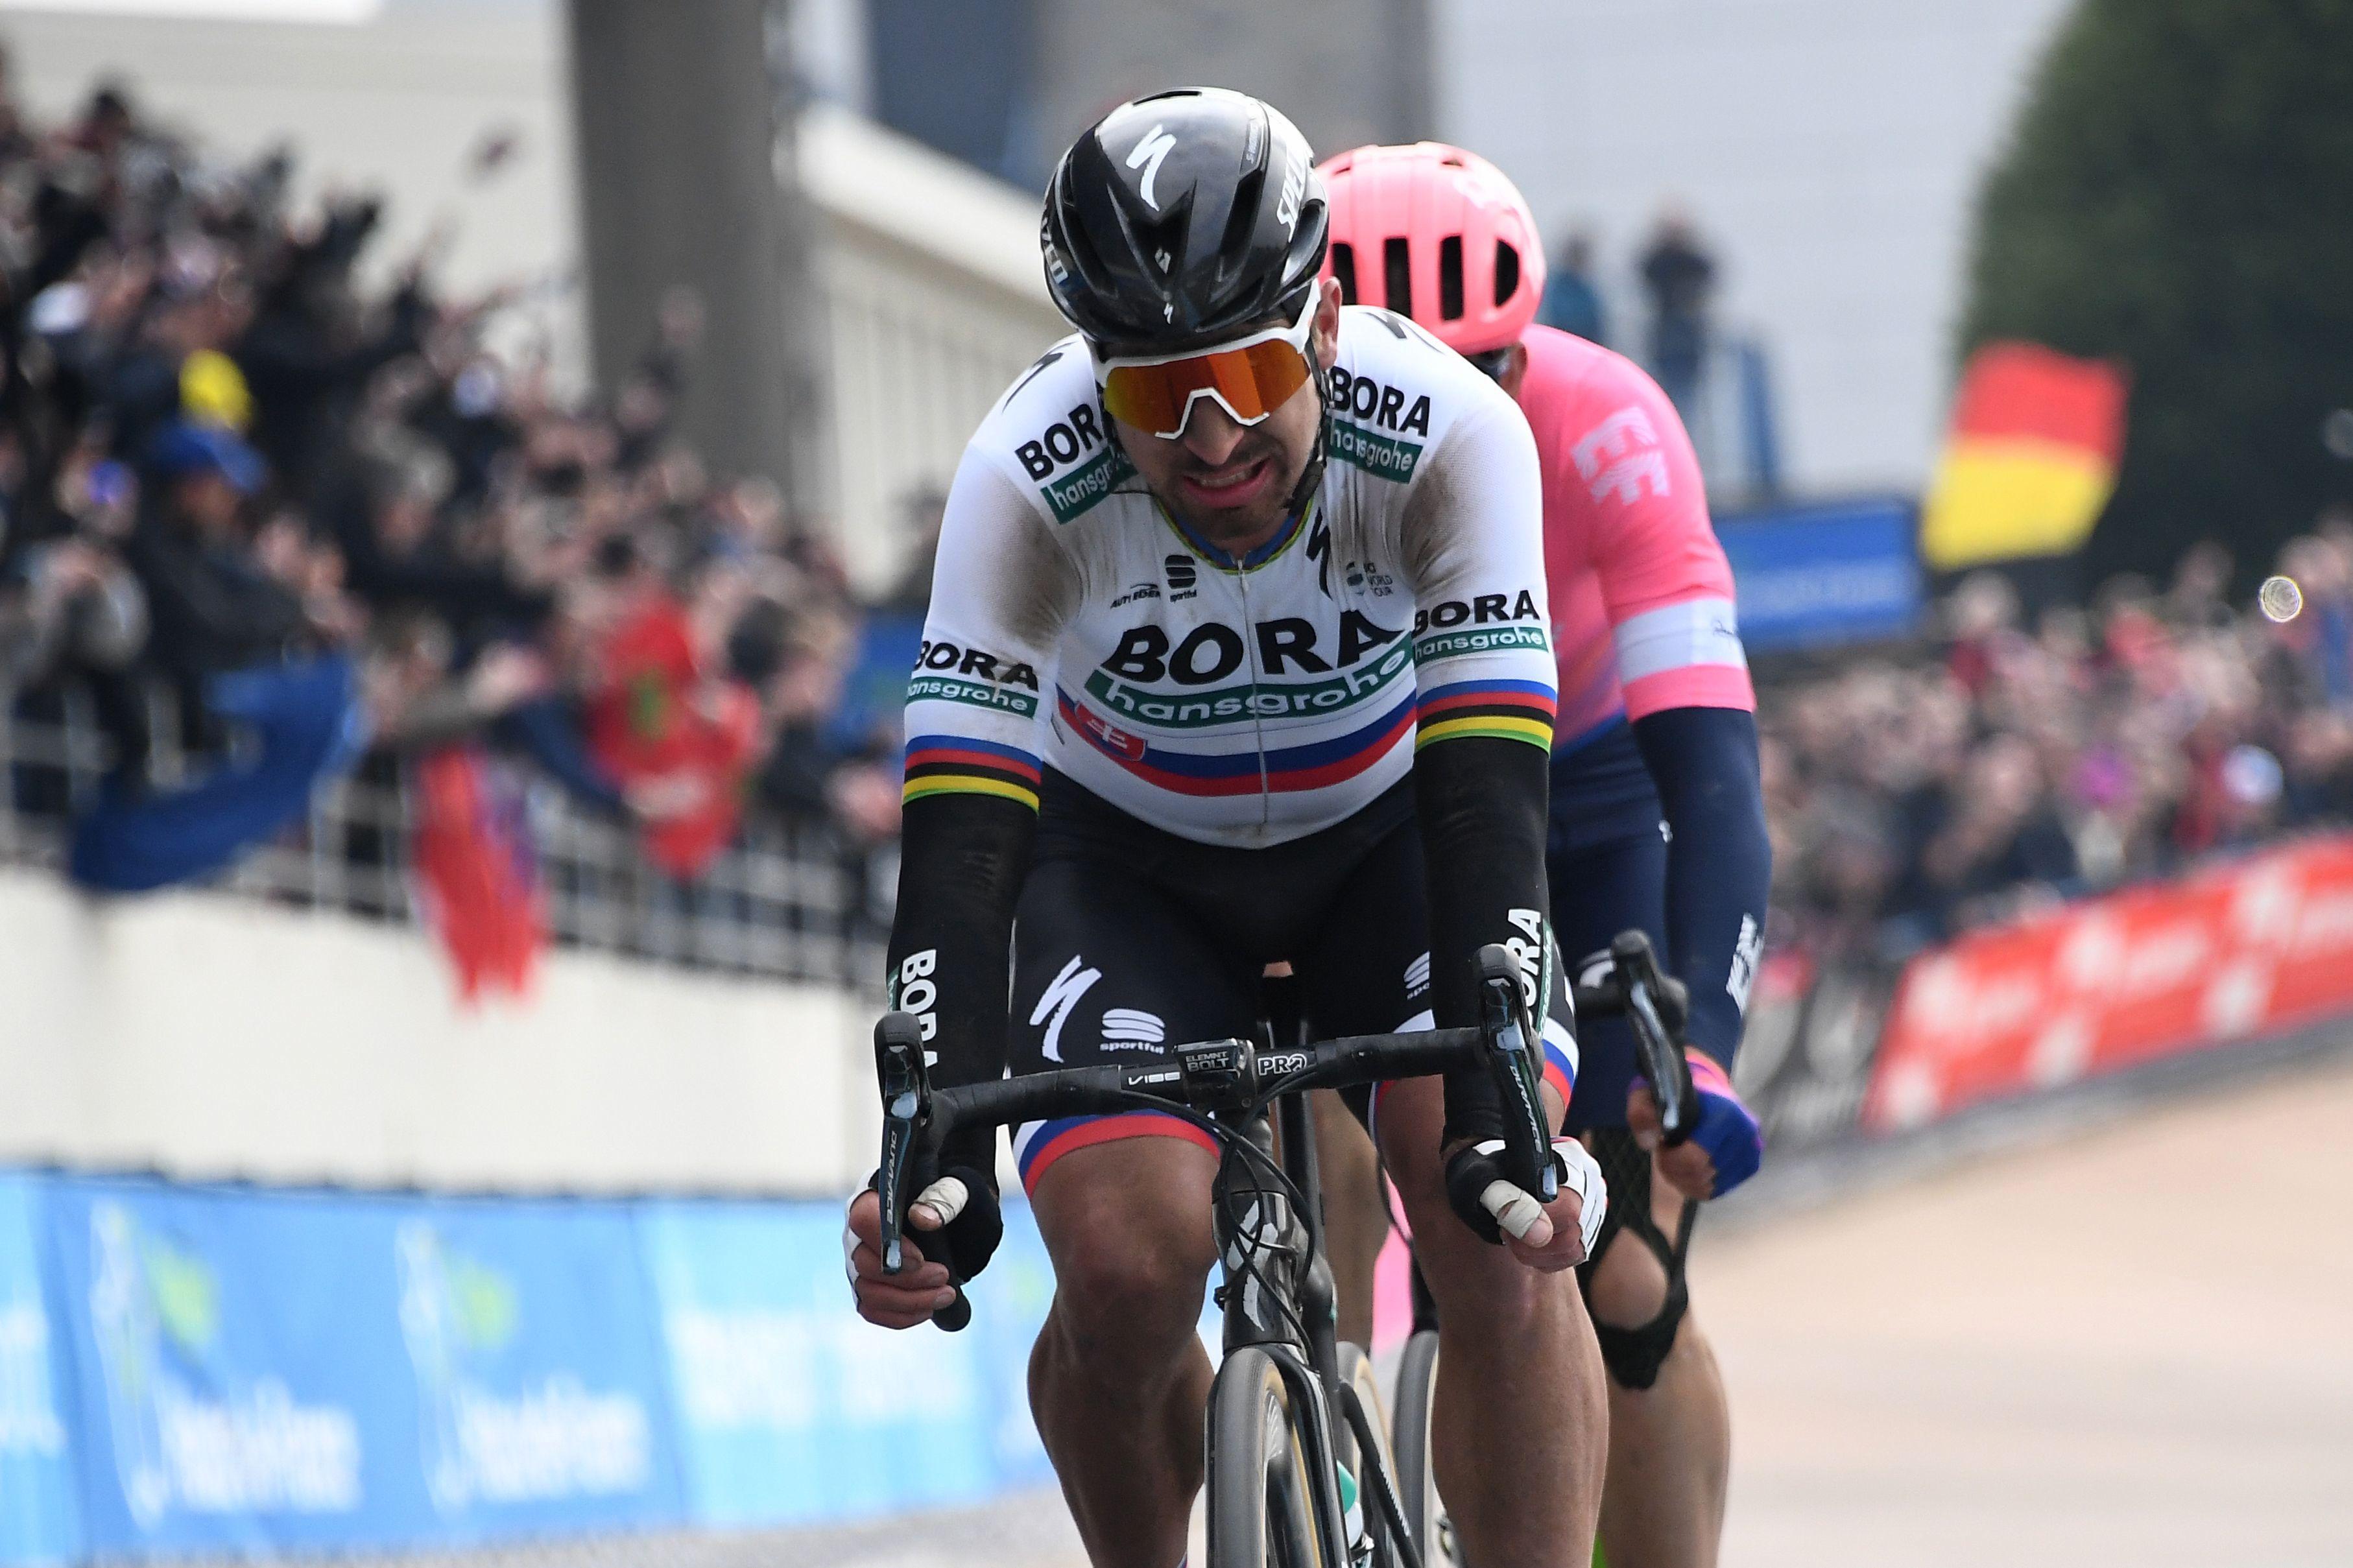 Cyclisme - Peter Sagan, battant mais battu